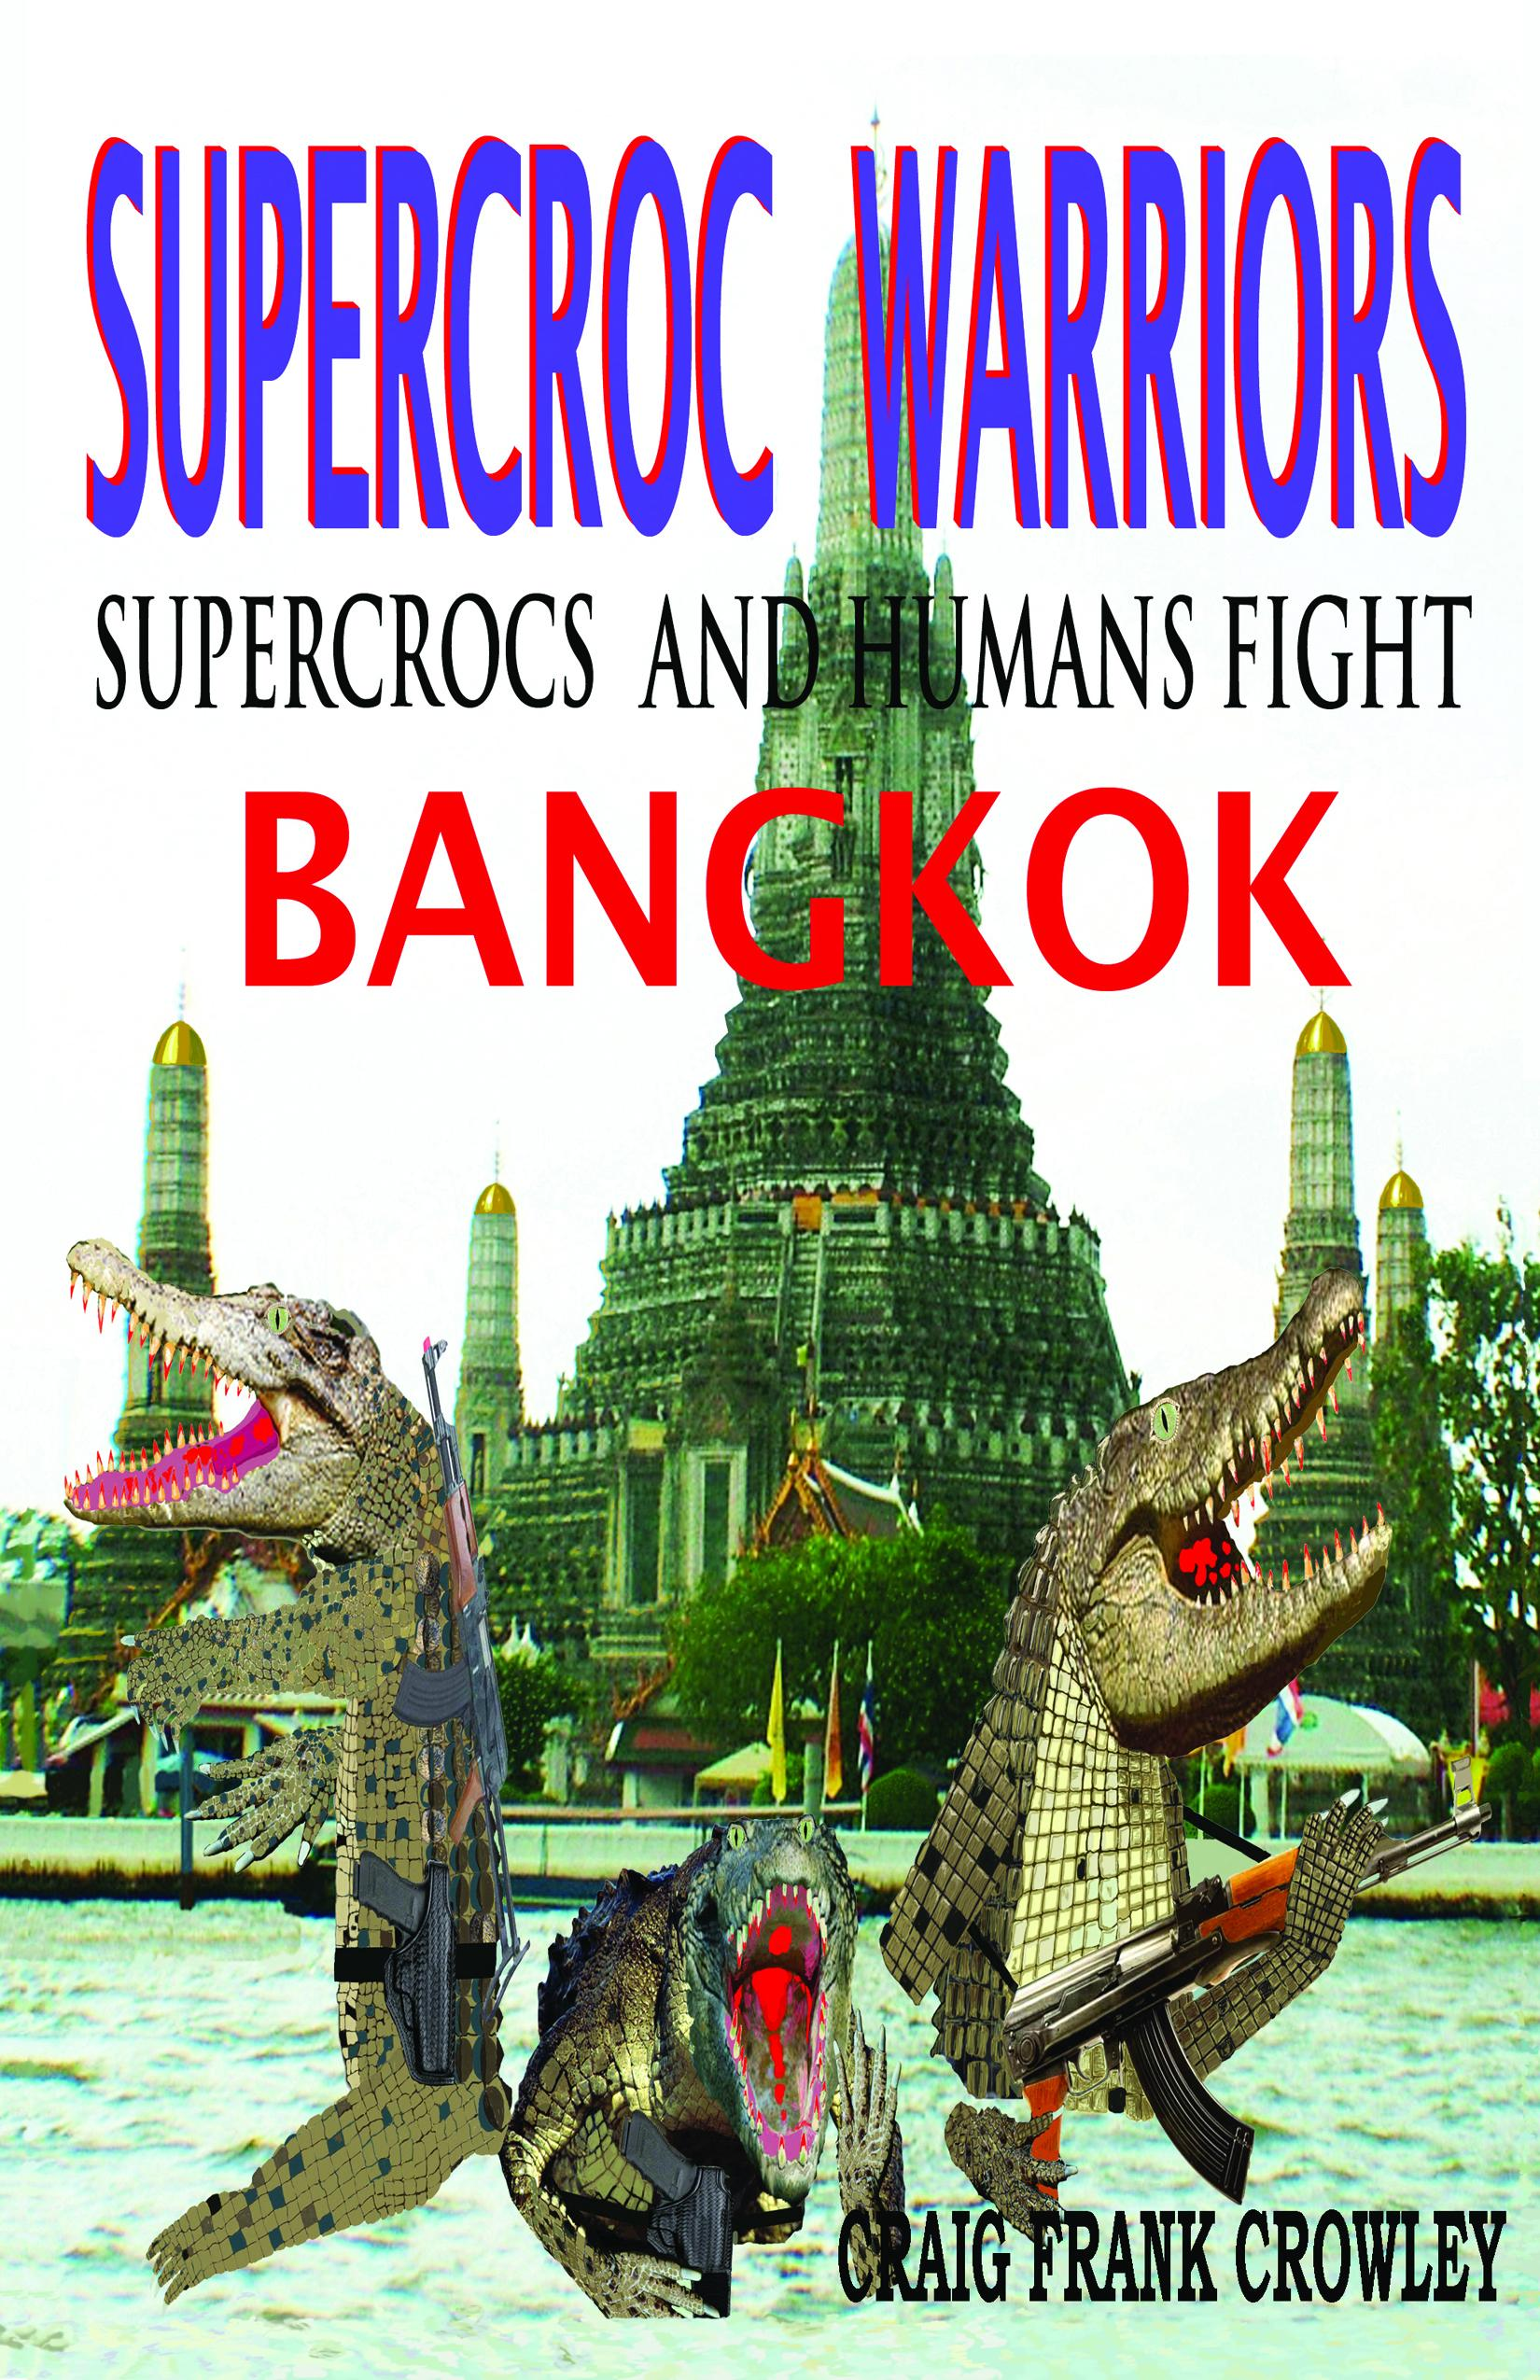 Supercroc Warriors